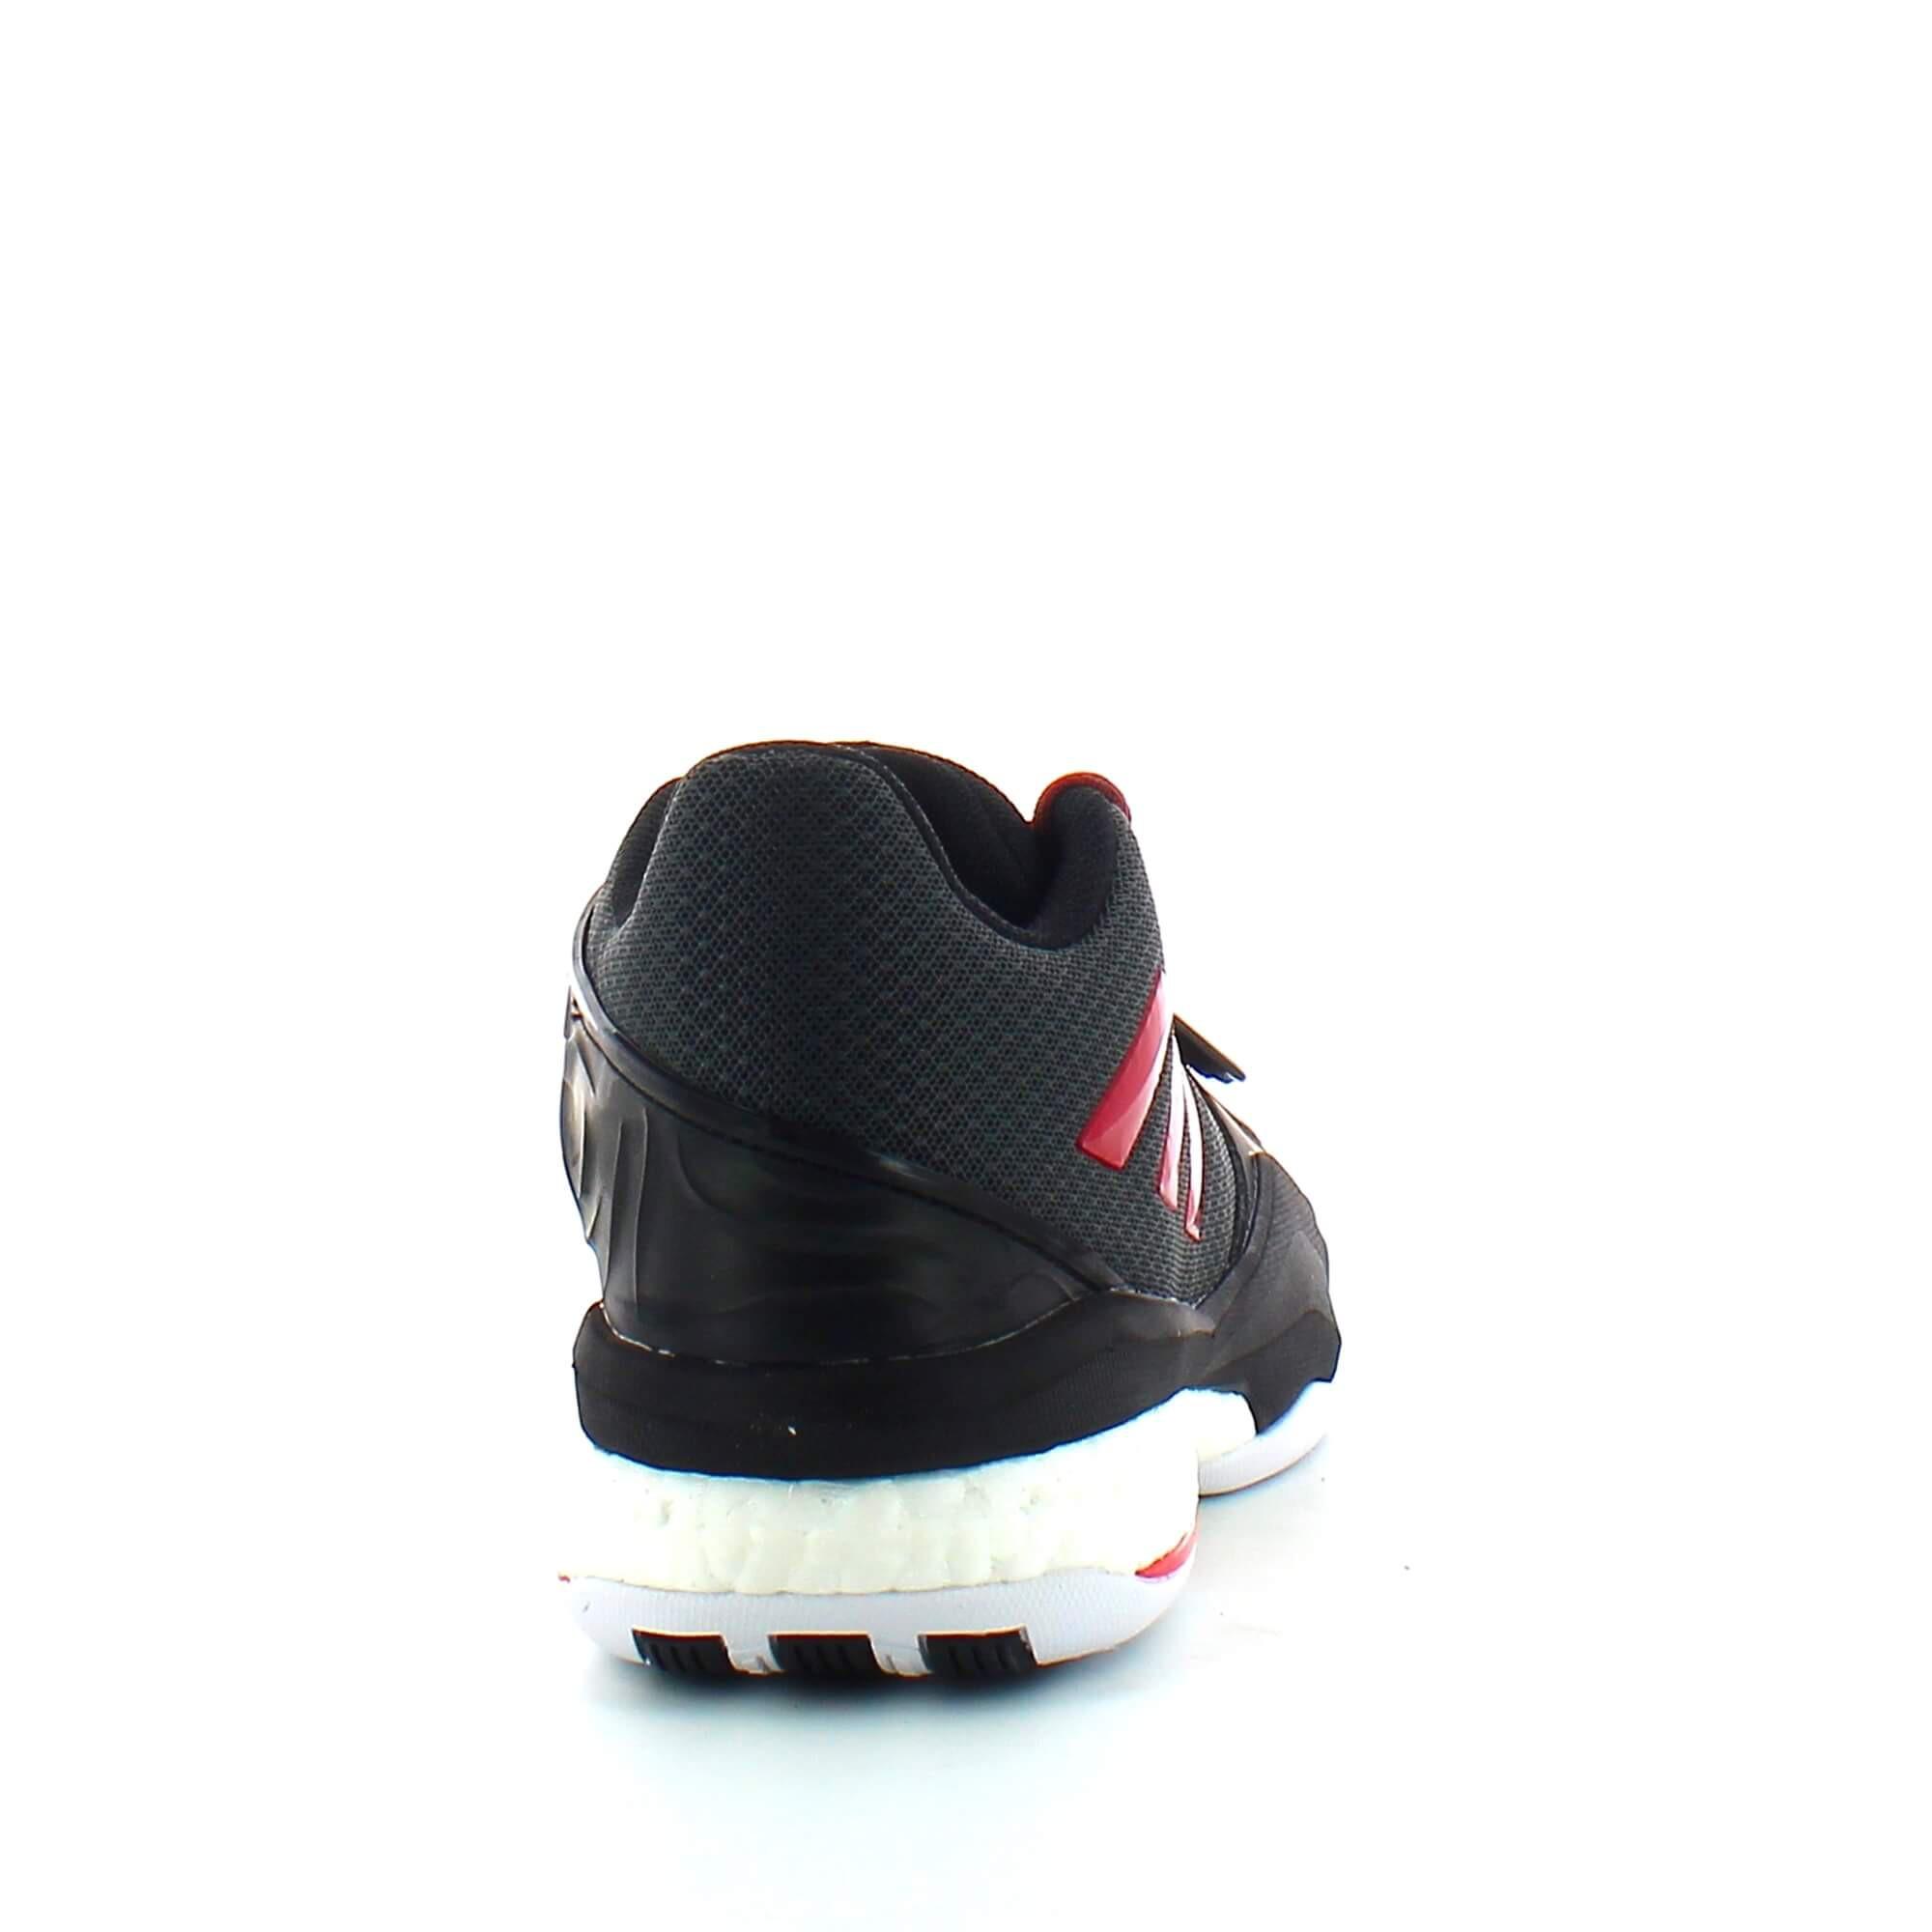 timeless design fa7ab 40a9b Zapatillas Adidas D Rose Englewood Gris Hombre - Deportes Mo